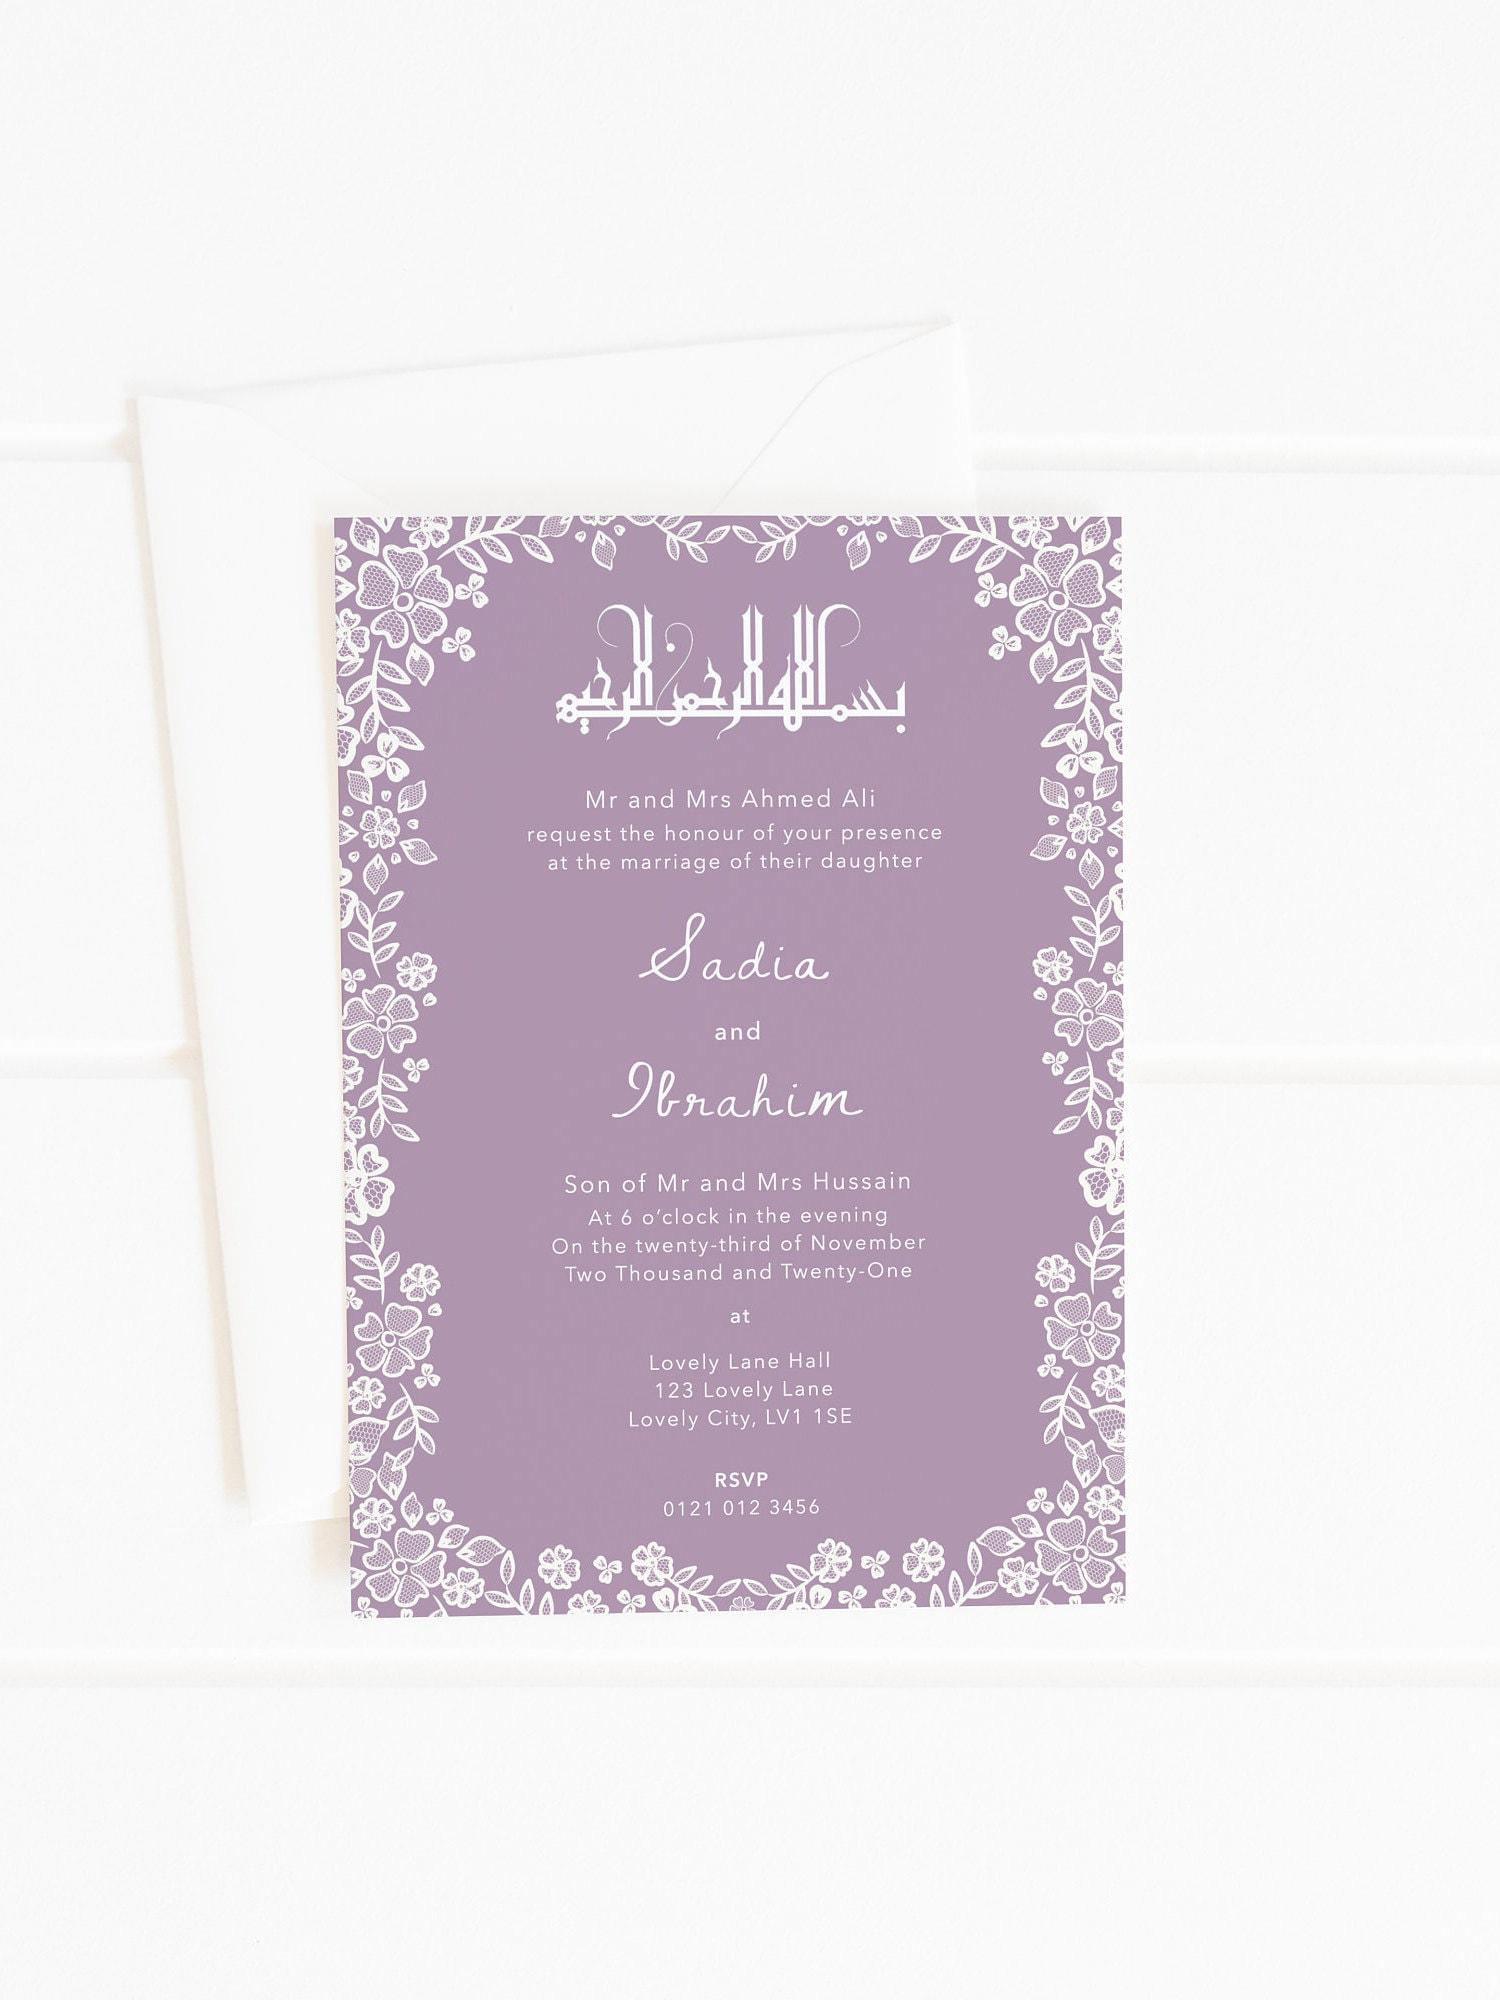 Wedding Invitation Nikah Muslim Wedding Invitation Nikkah   Etsy